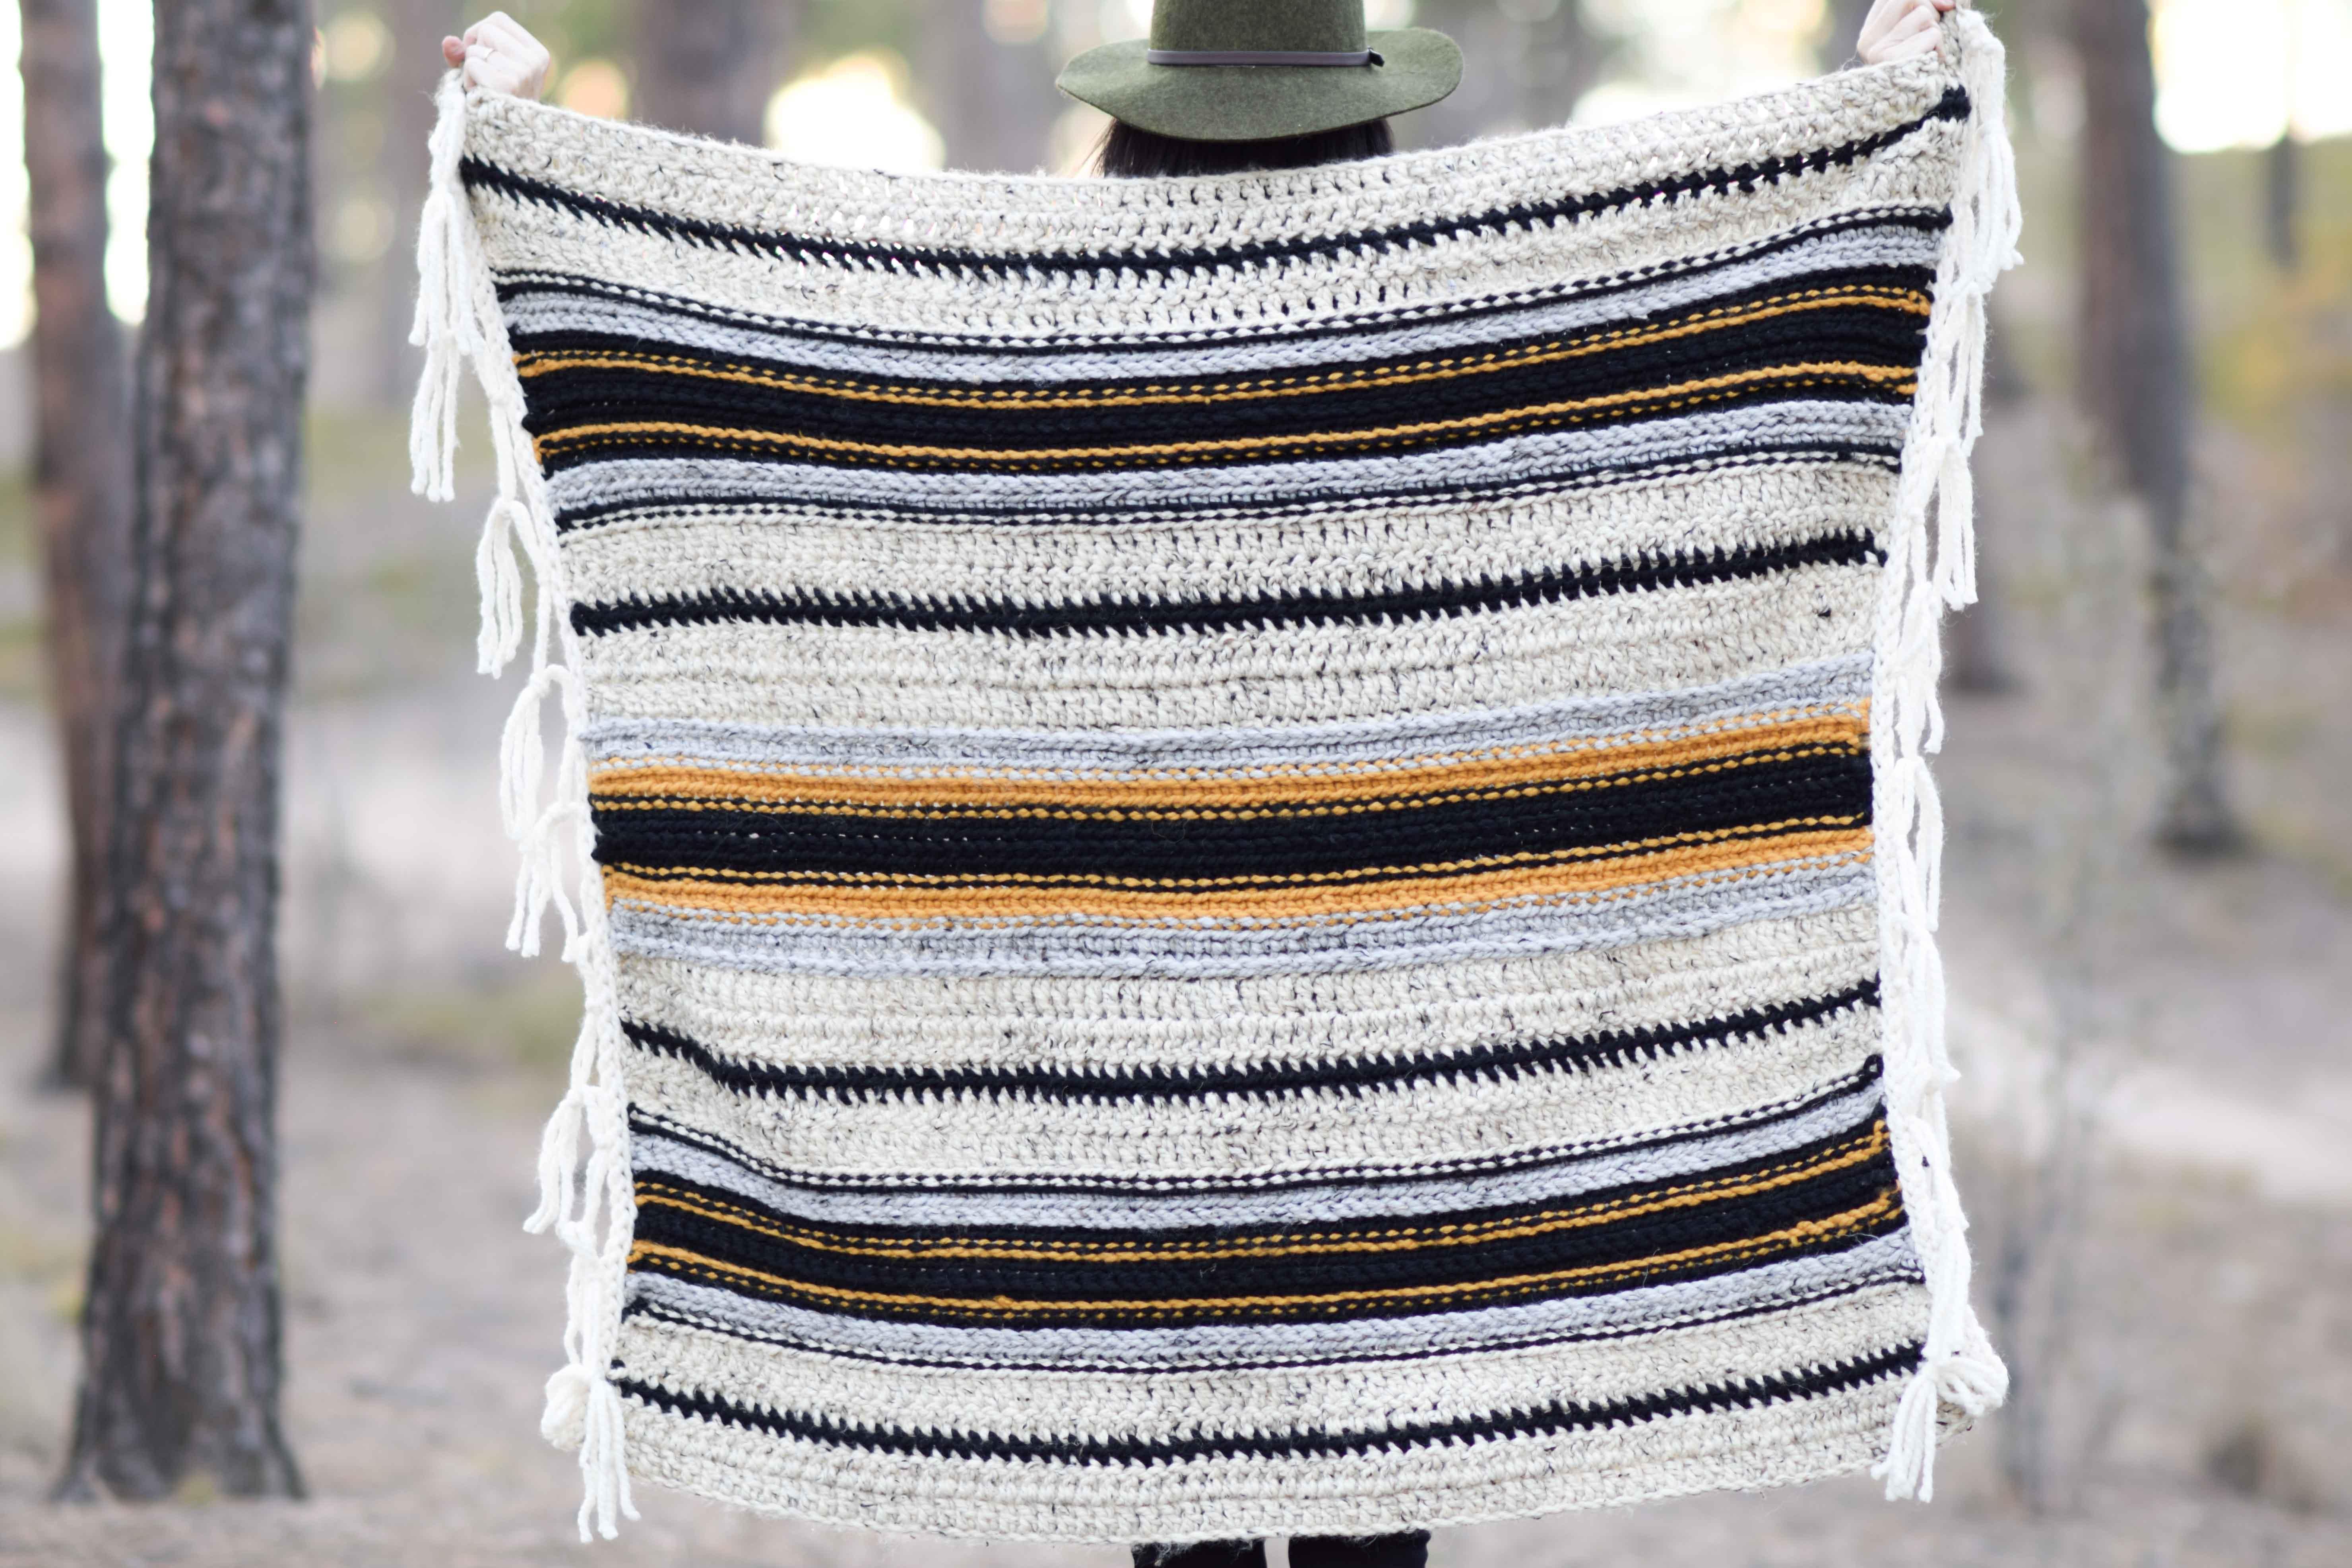 Mexican Serape Blanket Crochet Pattern Mama In A Stitch